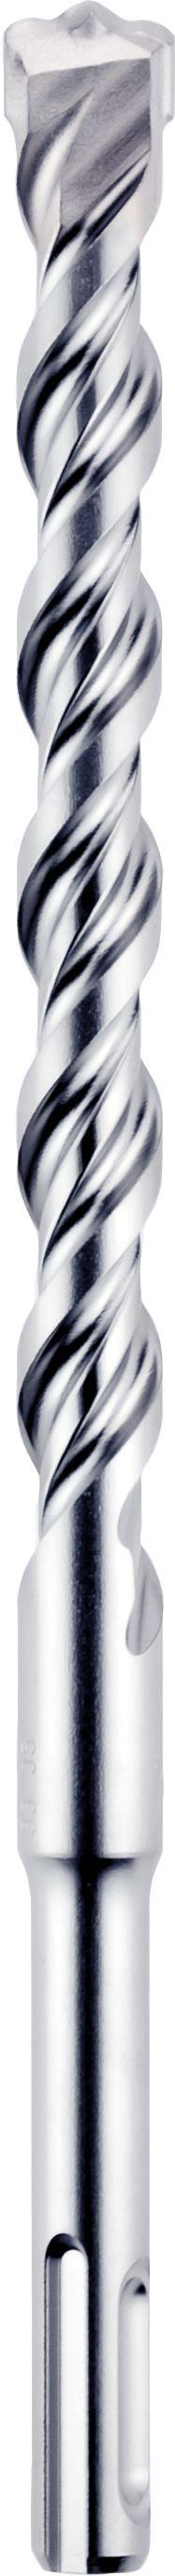 Slika BORER Rocket 3 SDS-plus 12x210 mm